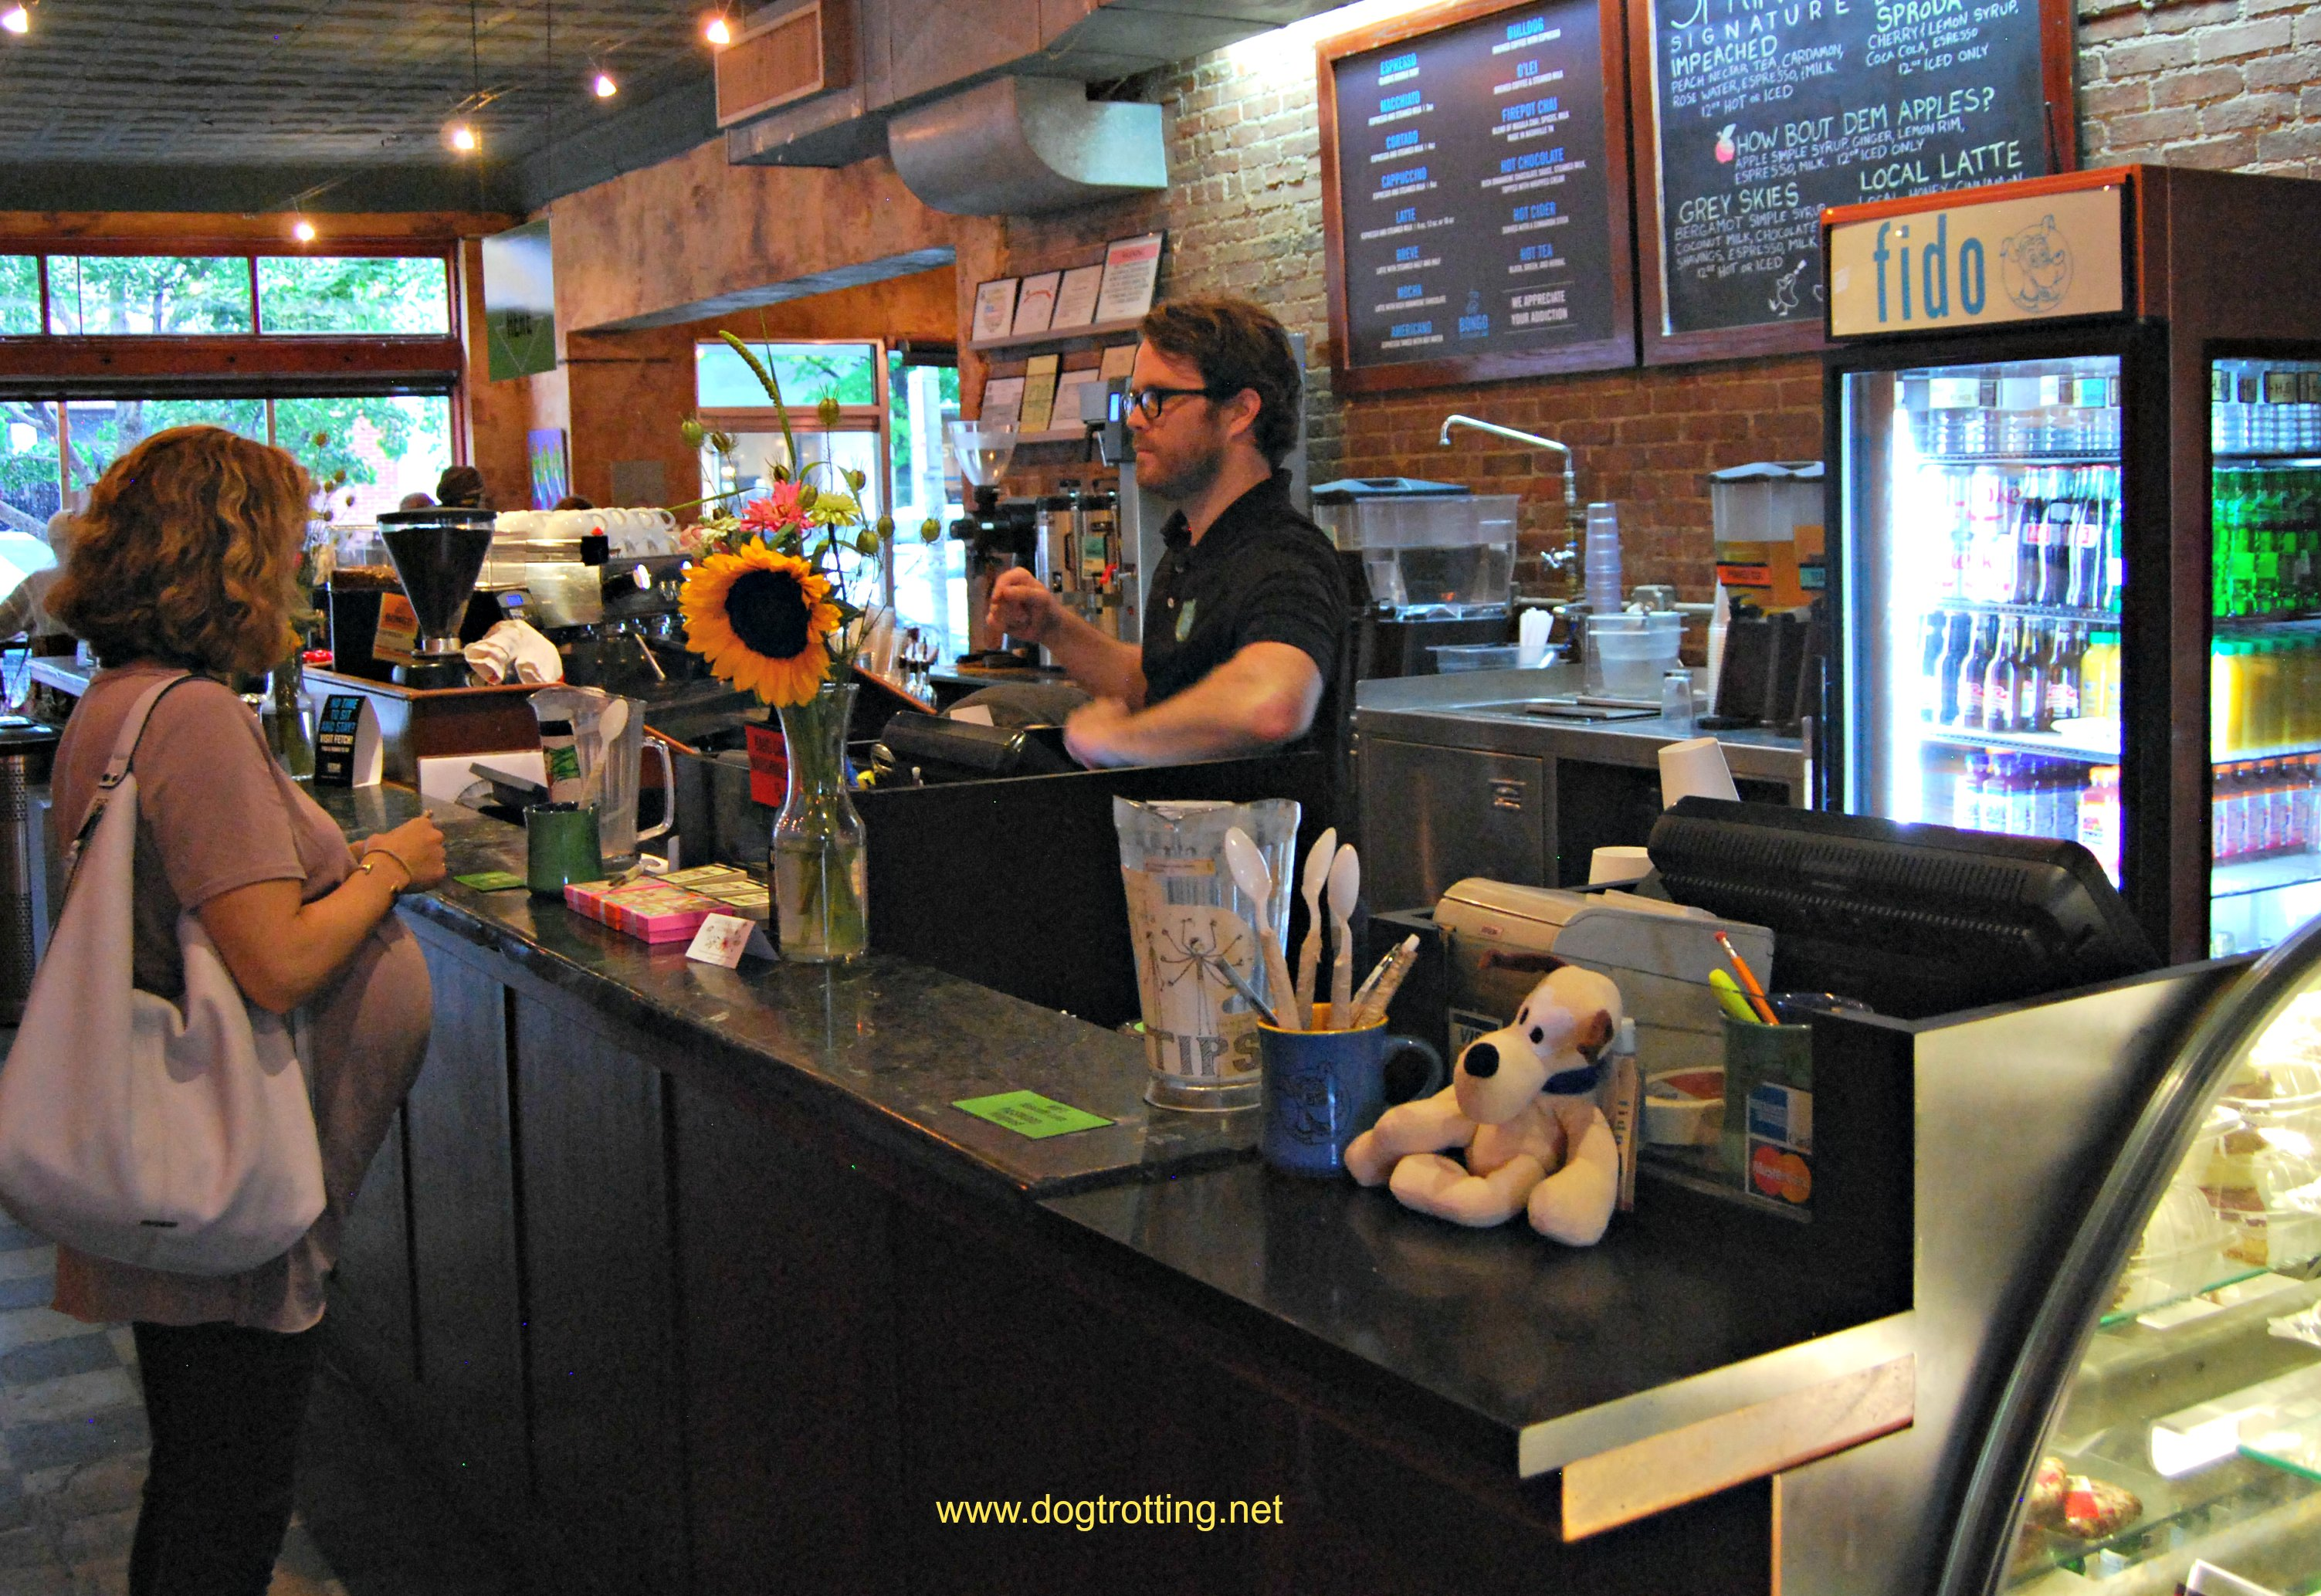 Fido coffee shop Nashville dogtrotting.net